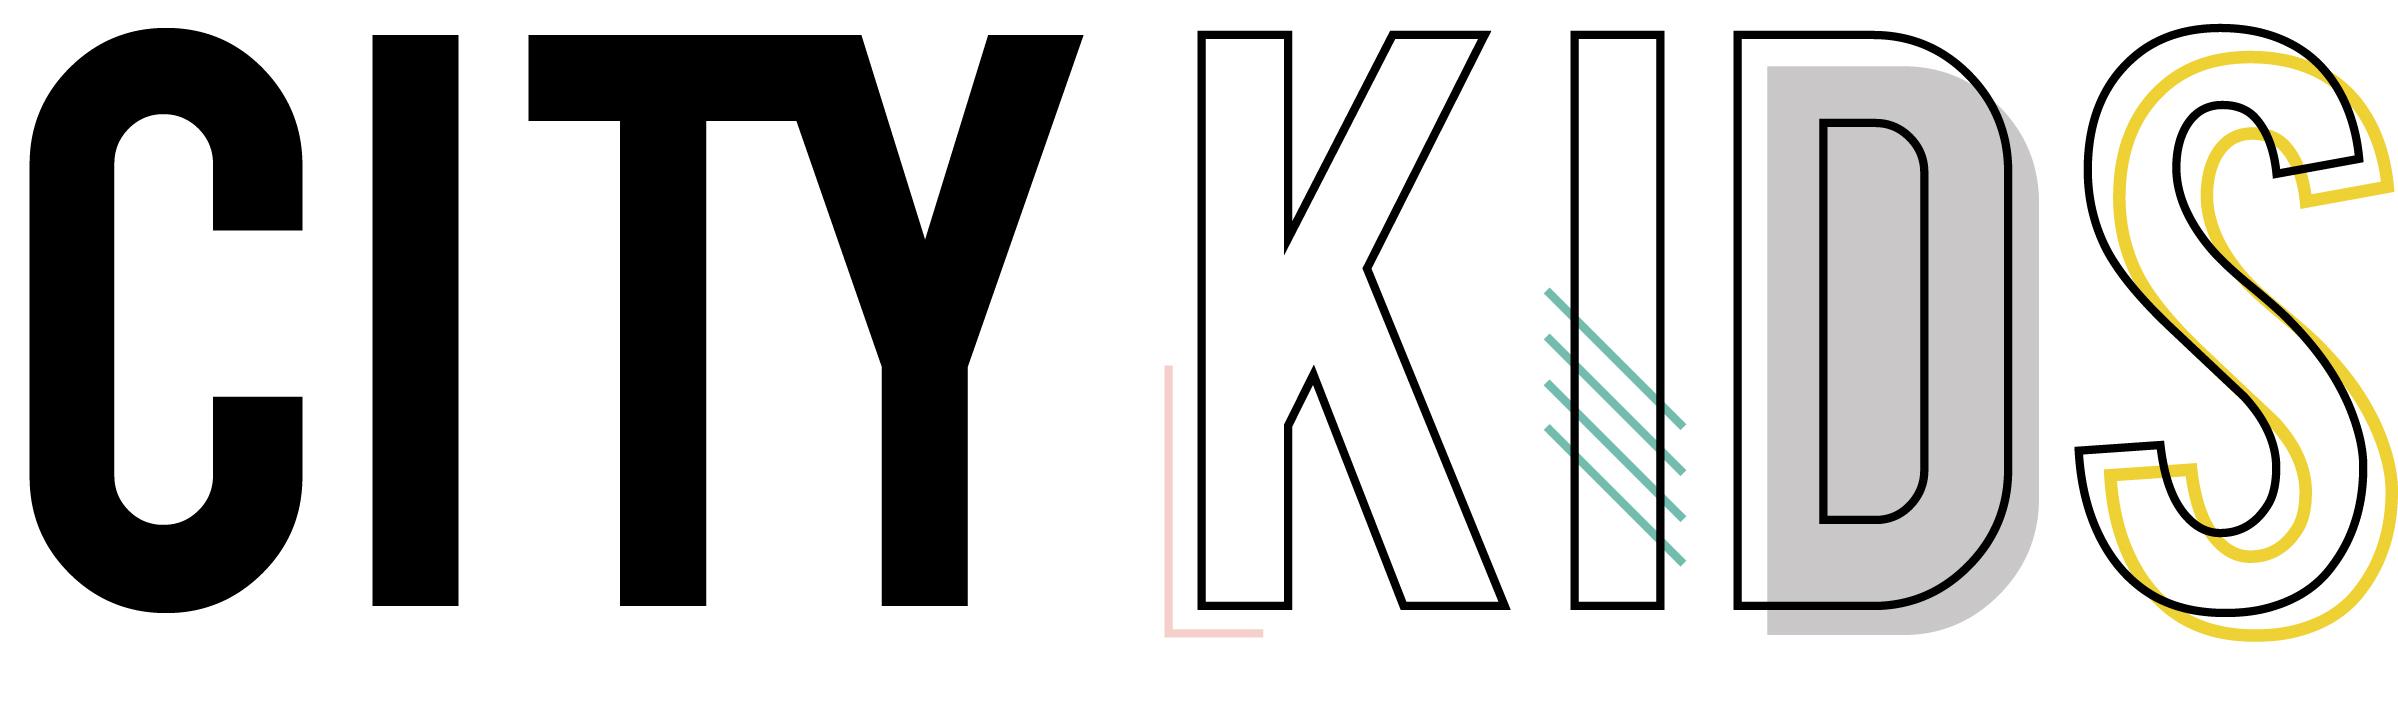 CityKidsweb.jpg